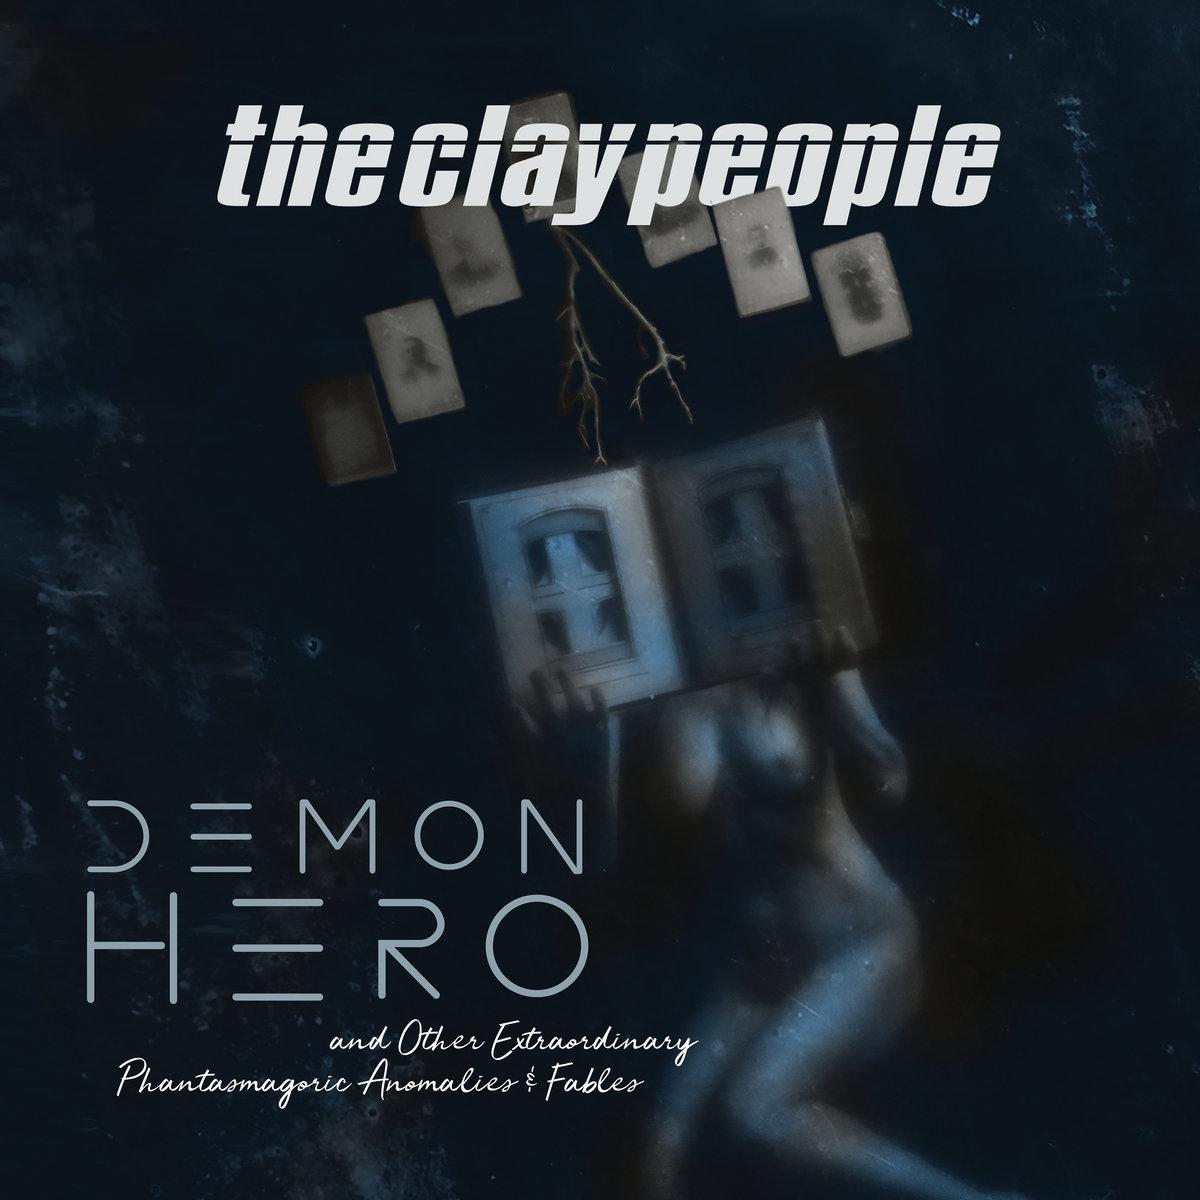 http://www.rockwired.com/DemonHeroLP.jpg